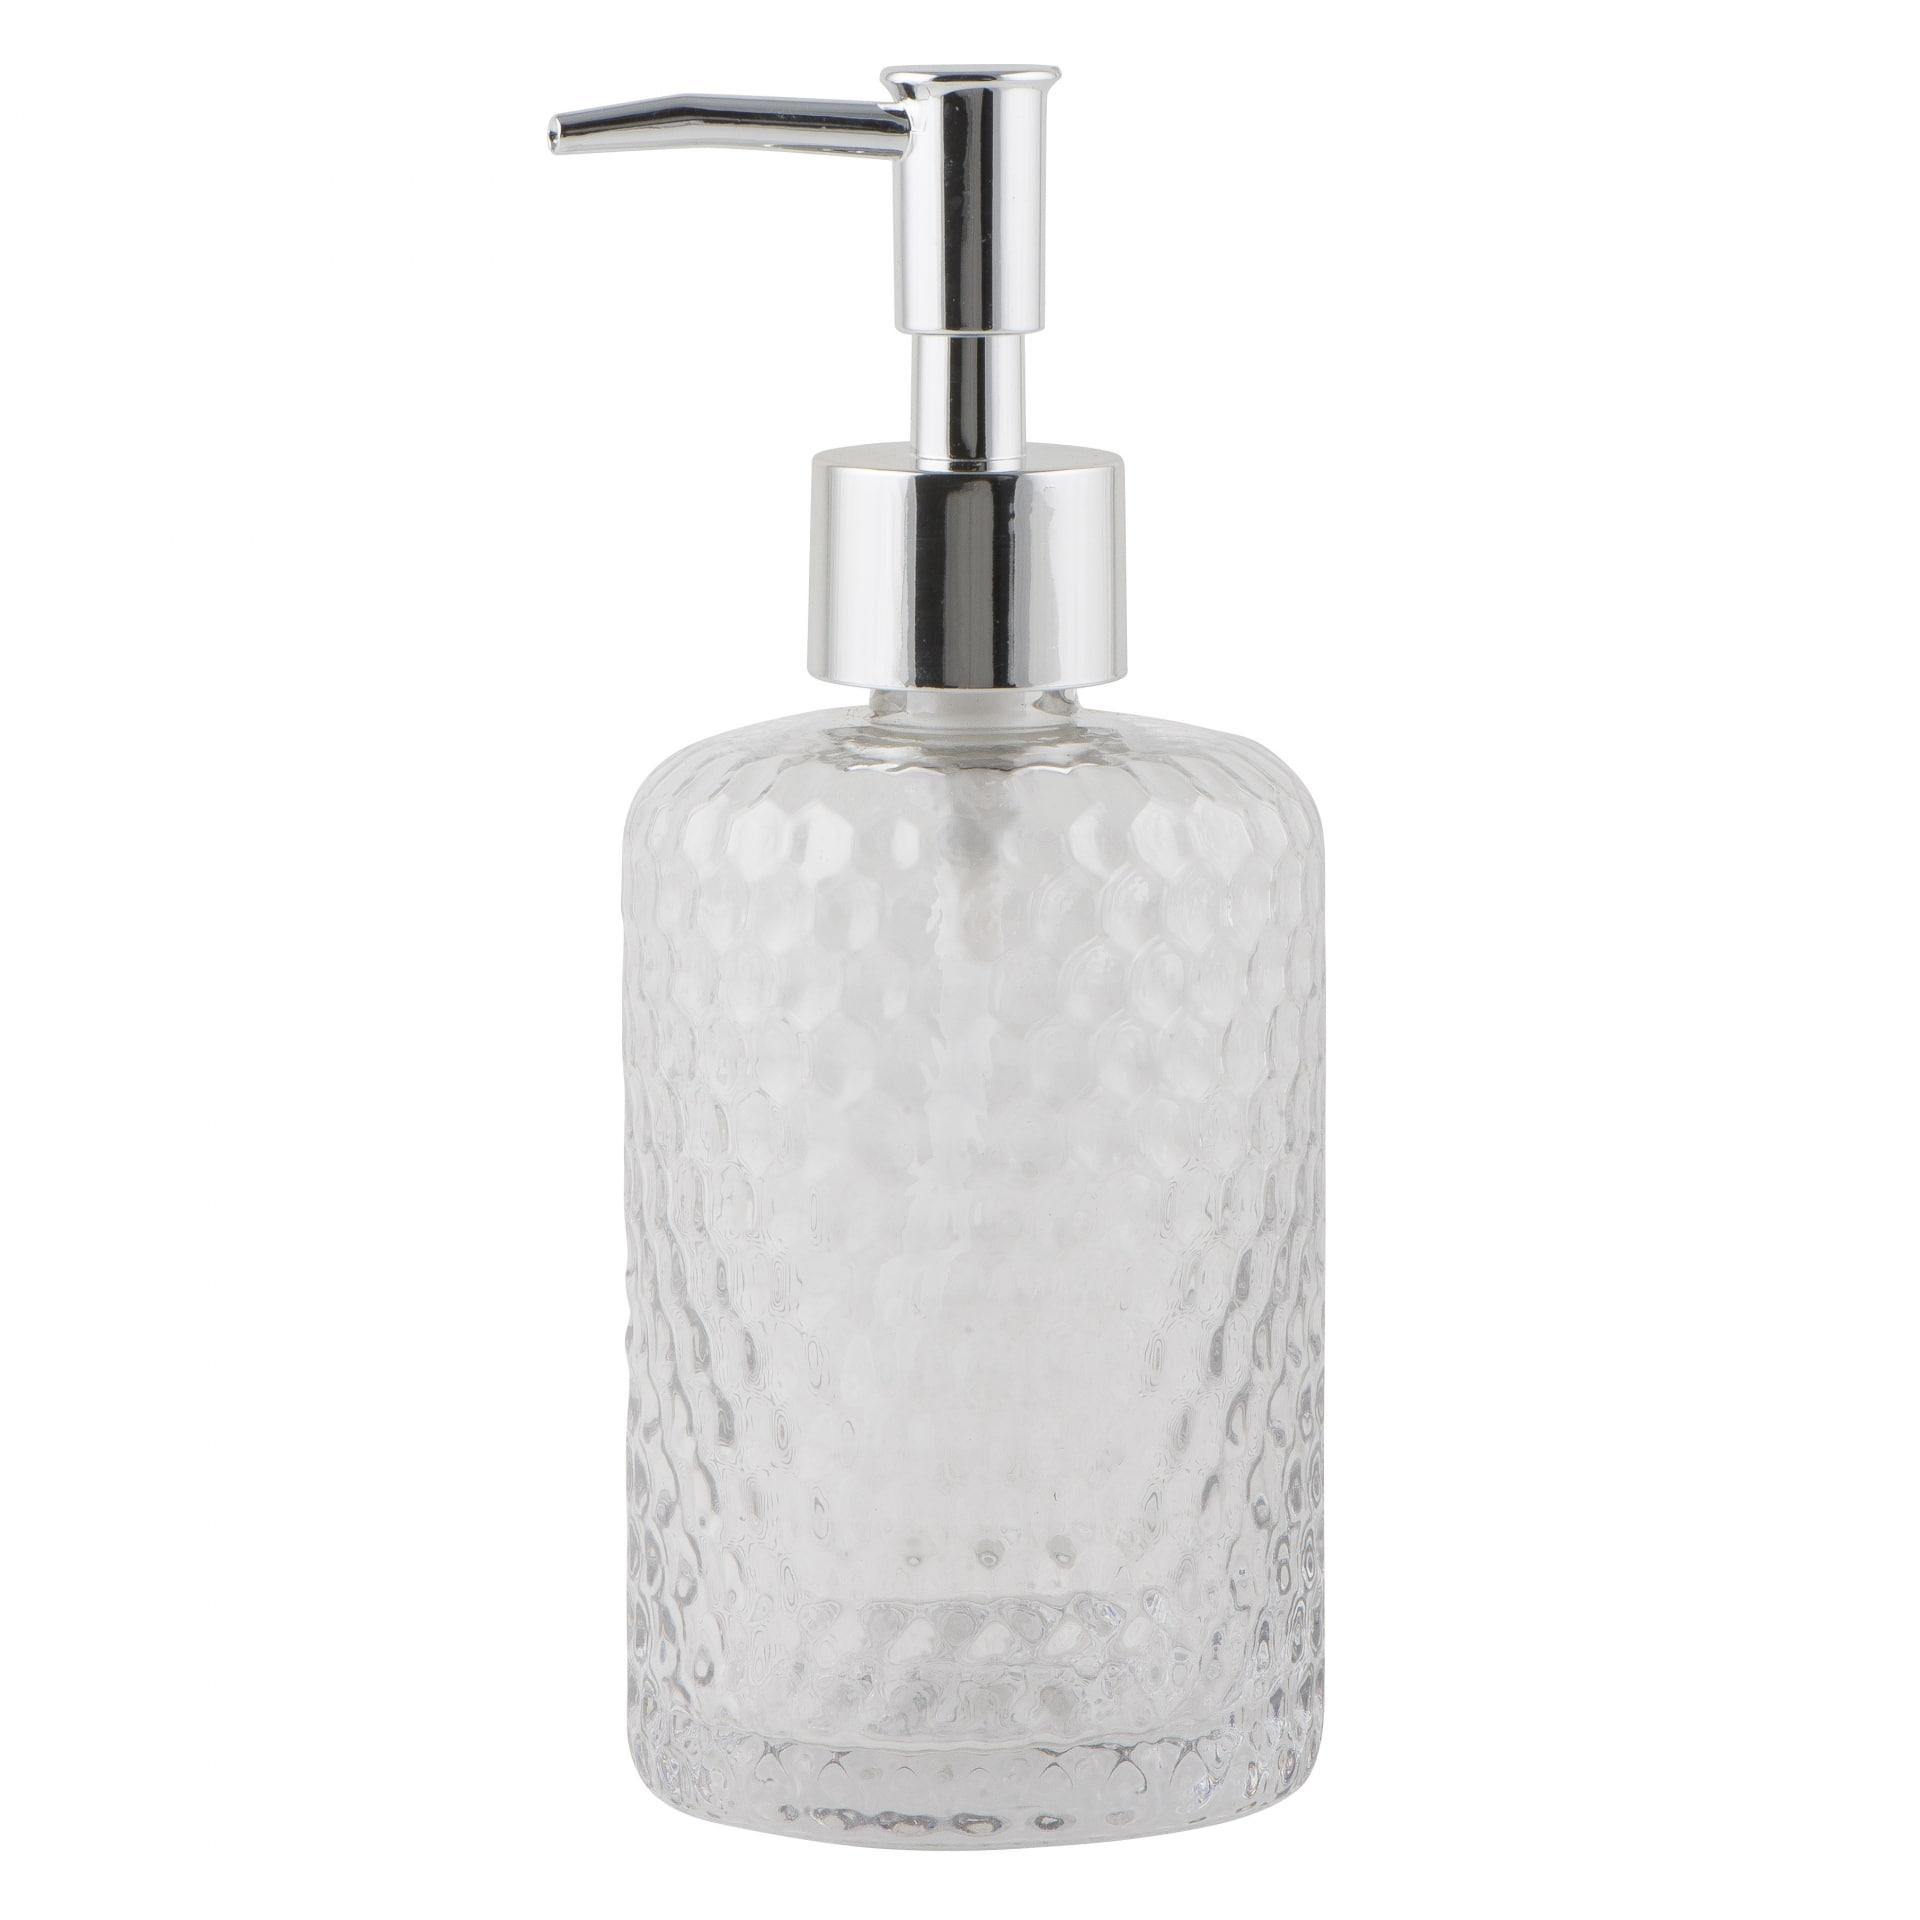 IB LAURSEN Zásobník na mýdlo Clear glass, čirá barva, sklo, plast